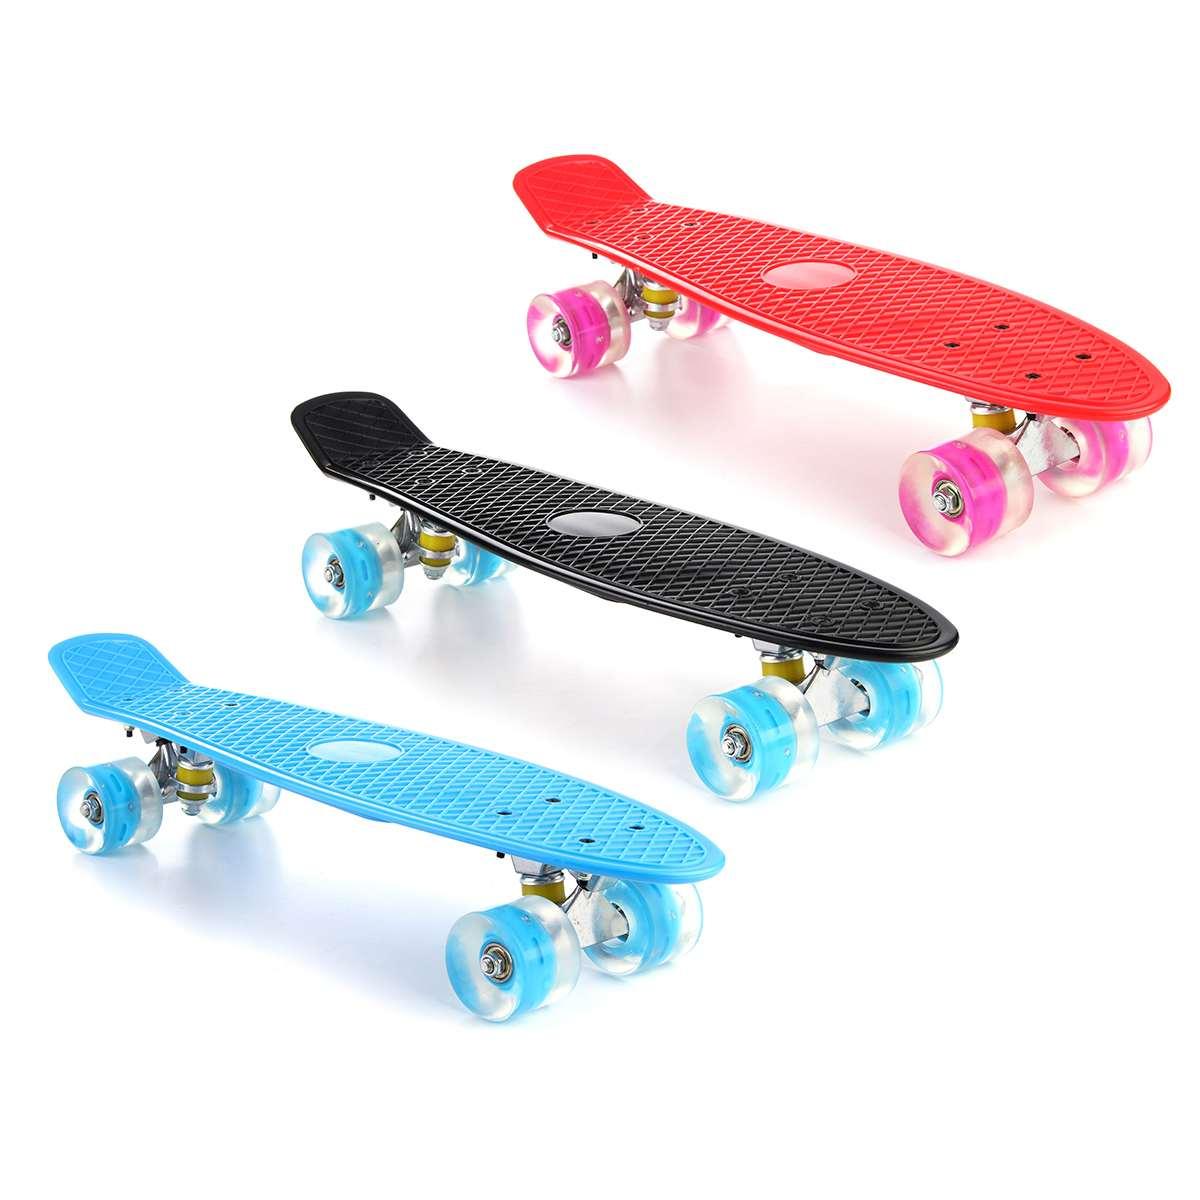 22 Inches Four-wheel Mini Longboard Pastel Color Skate Board Skateboard With LED Flashing Wheels Retro Skateboard